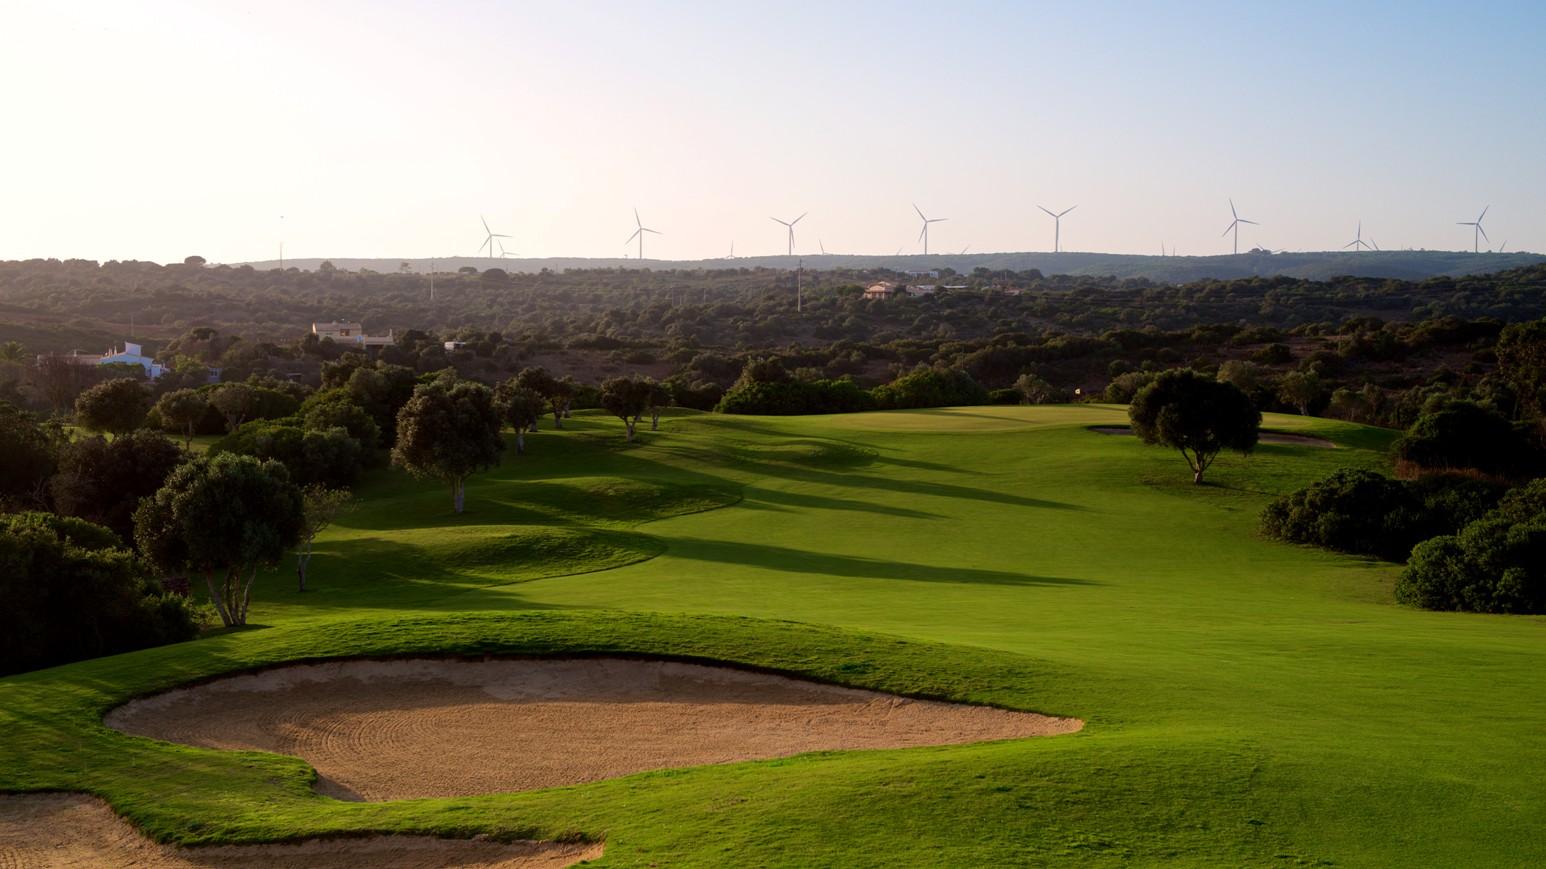 Espiche Golf_#10 Green from Fairway_D823722 web.jpg